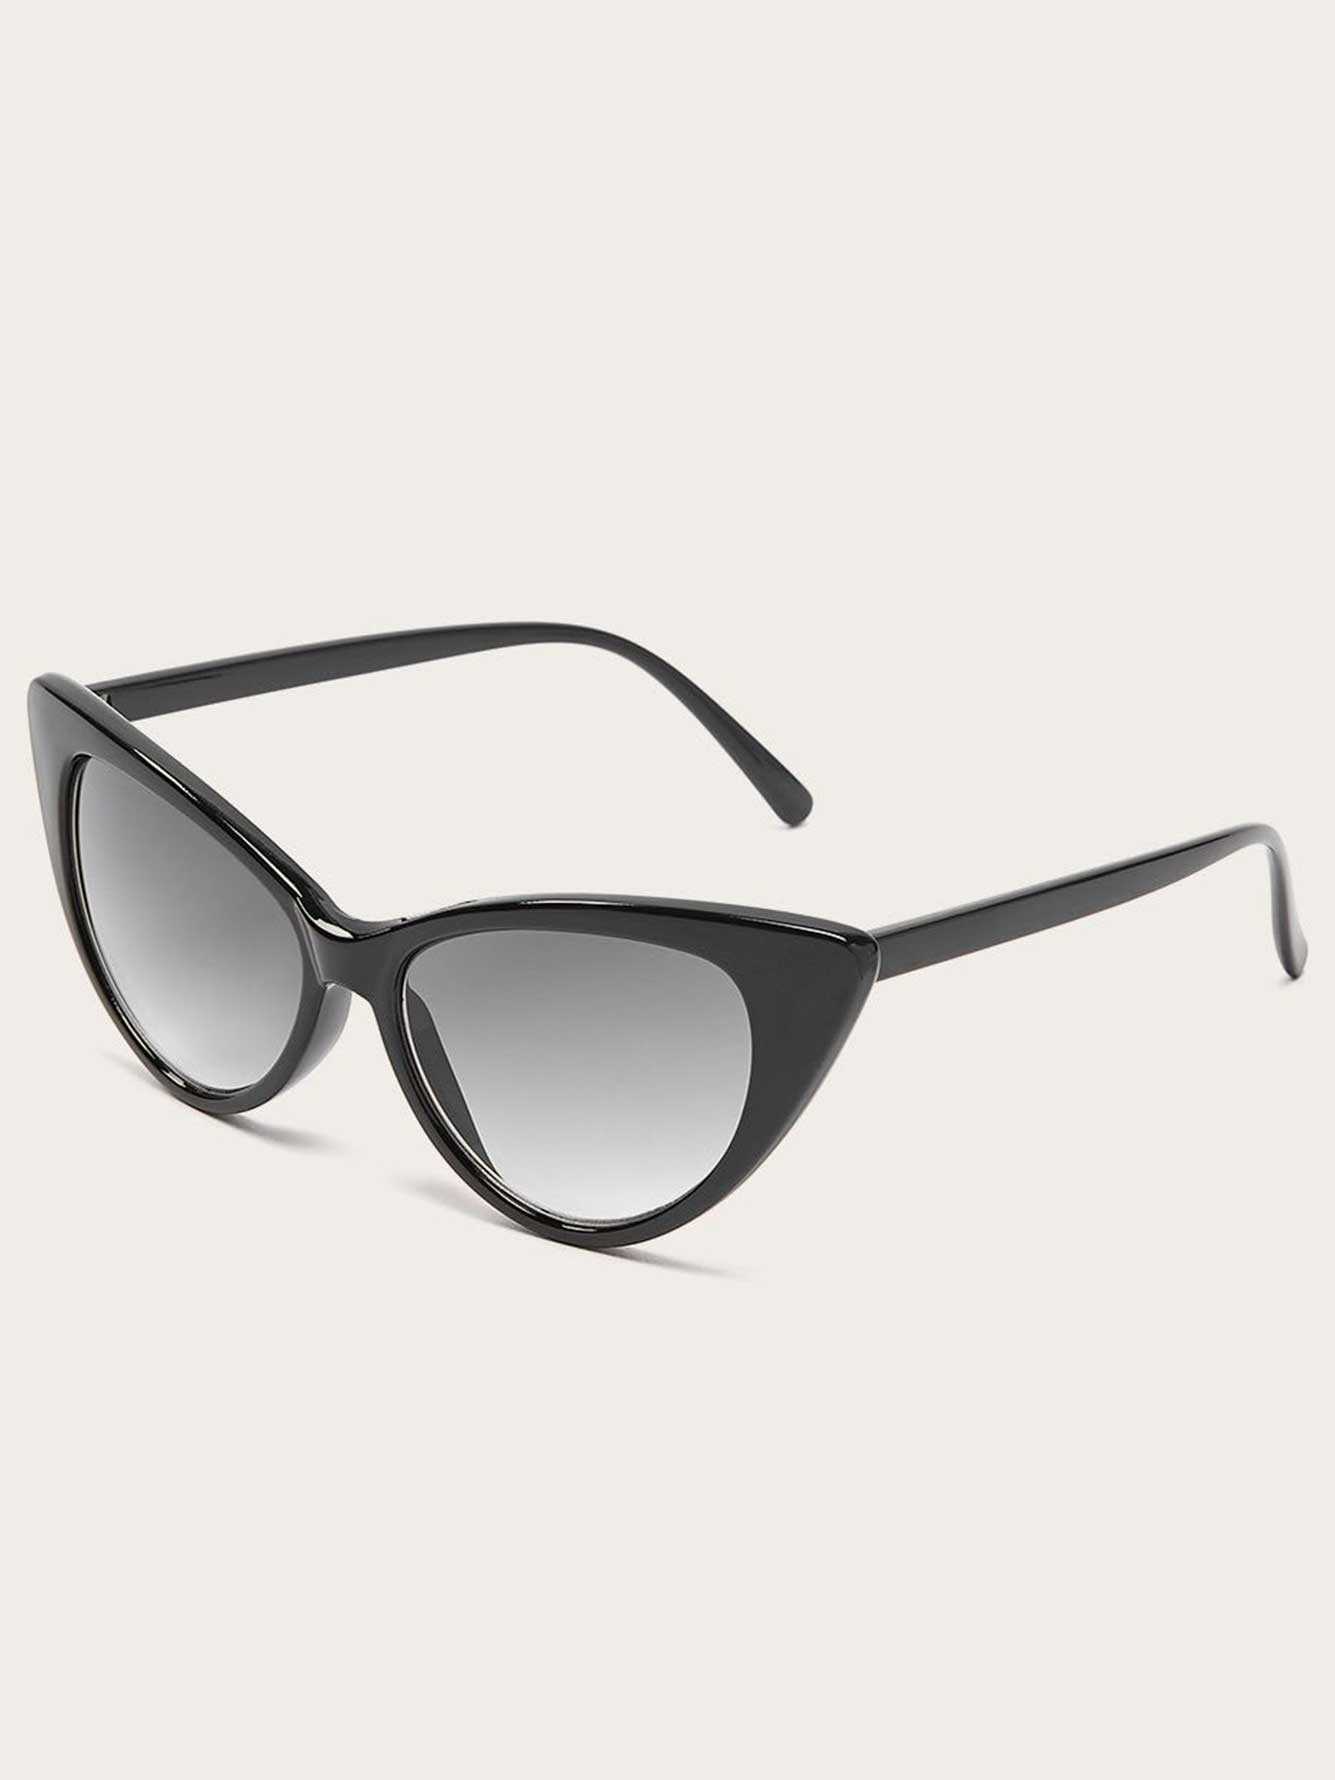 5b44322ffa4 Black Cat Eye Sunglasses